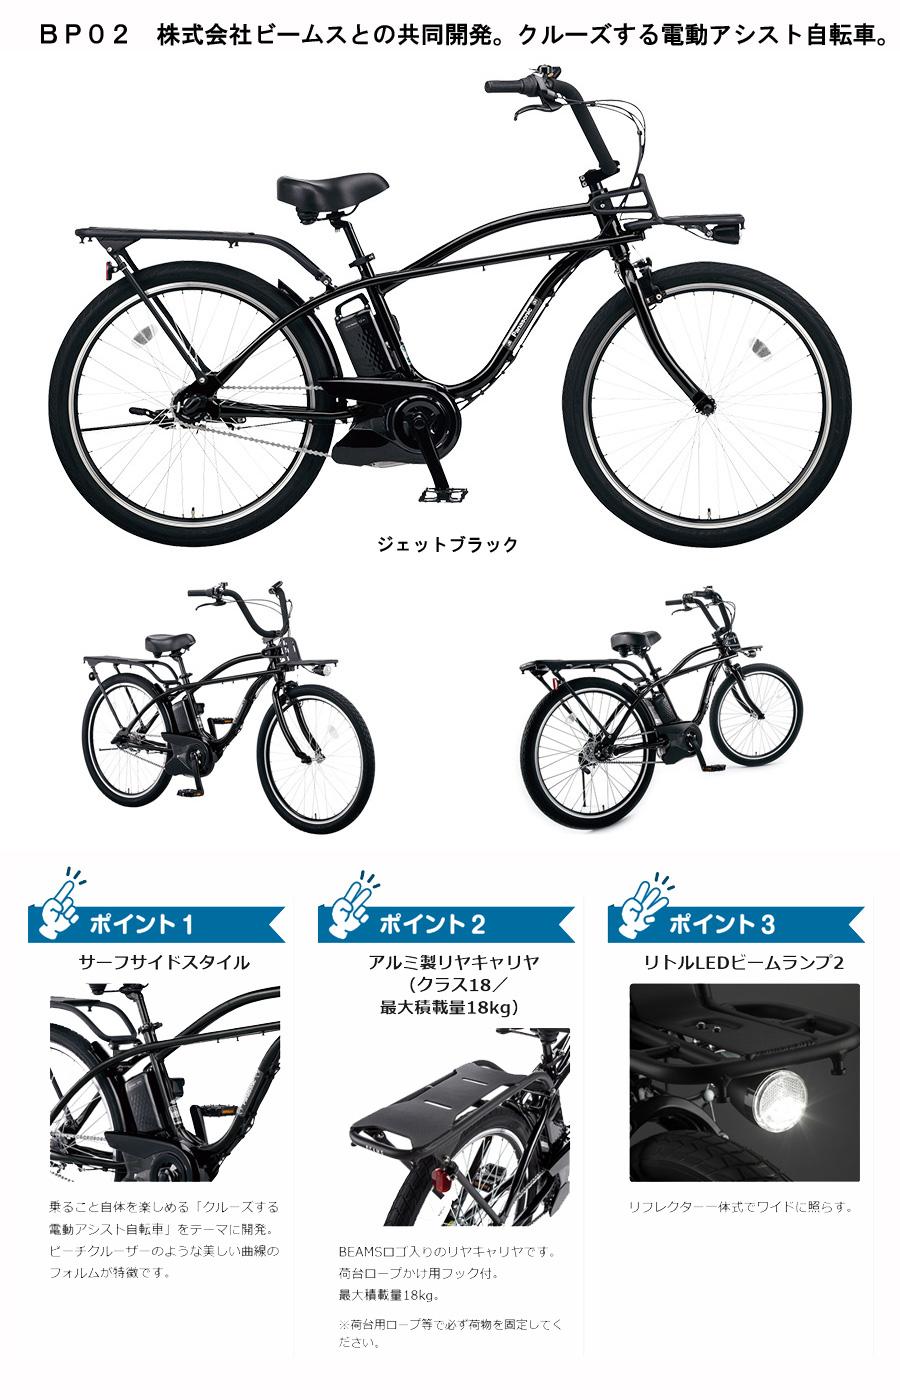 Panasonicパナソニック電動アシスト自転車 2019年モデルの商品案内